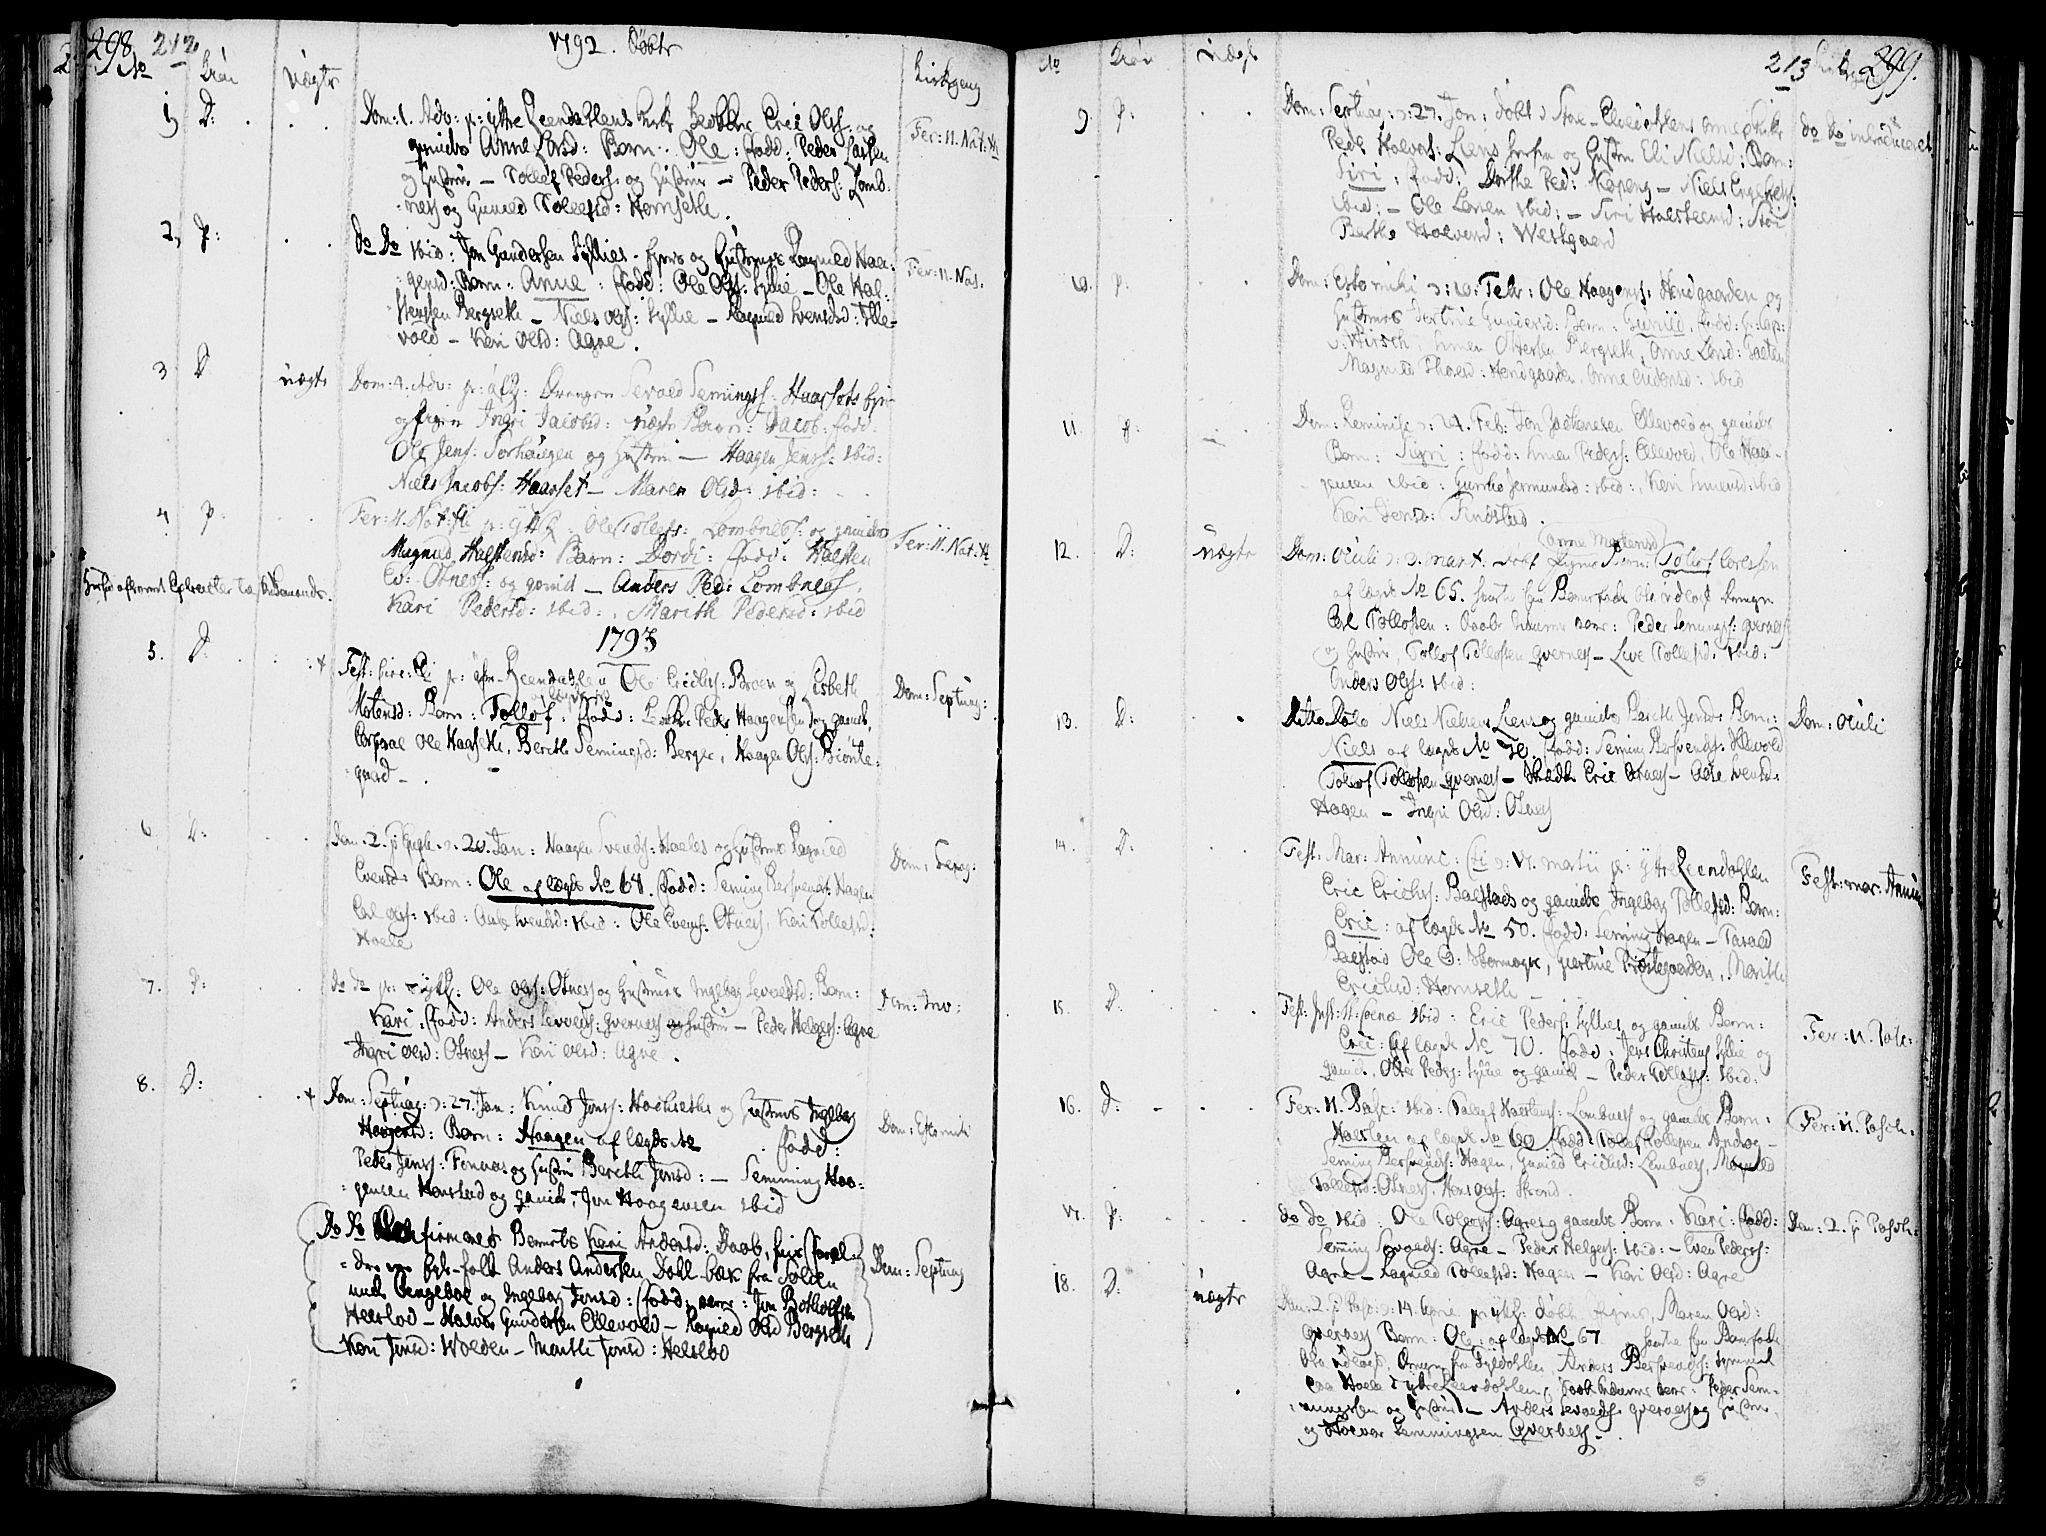 SAH, Rendalen prestekontor, H/Ha/Haa/L0002: Ministerialbok nr. 2, 1788-1814, s. 212-213